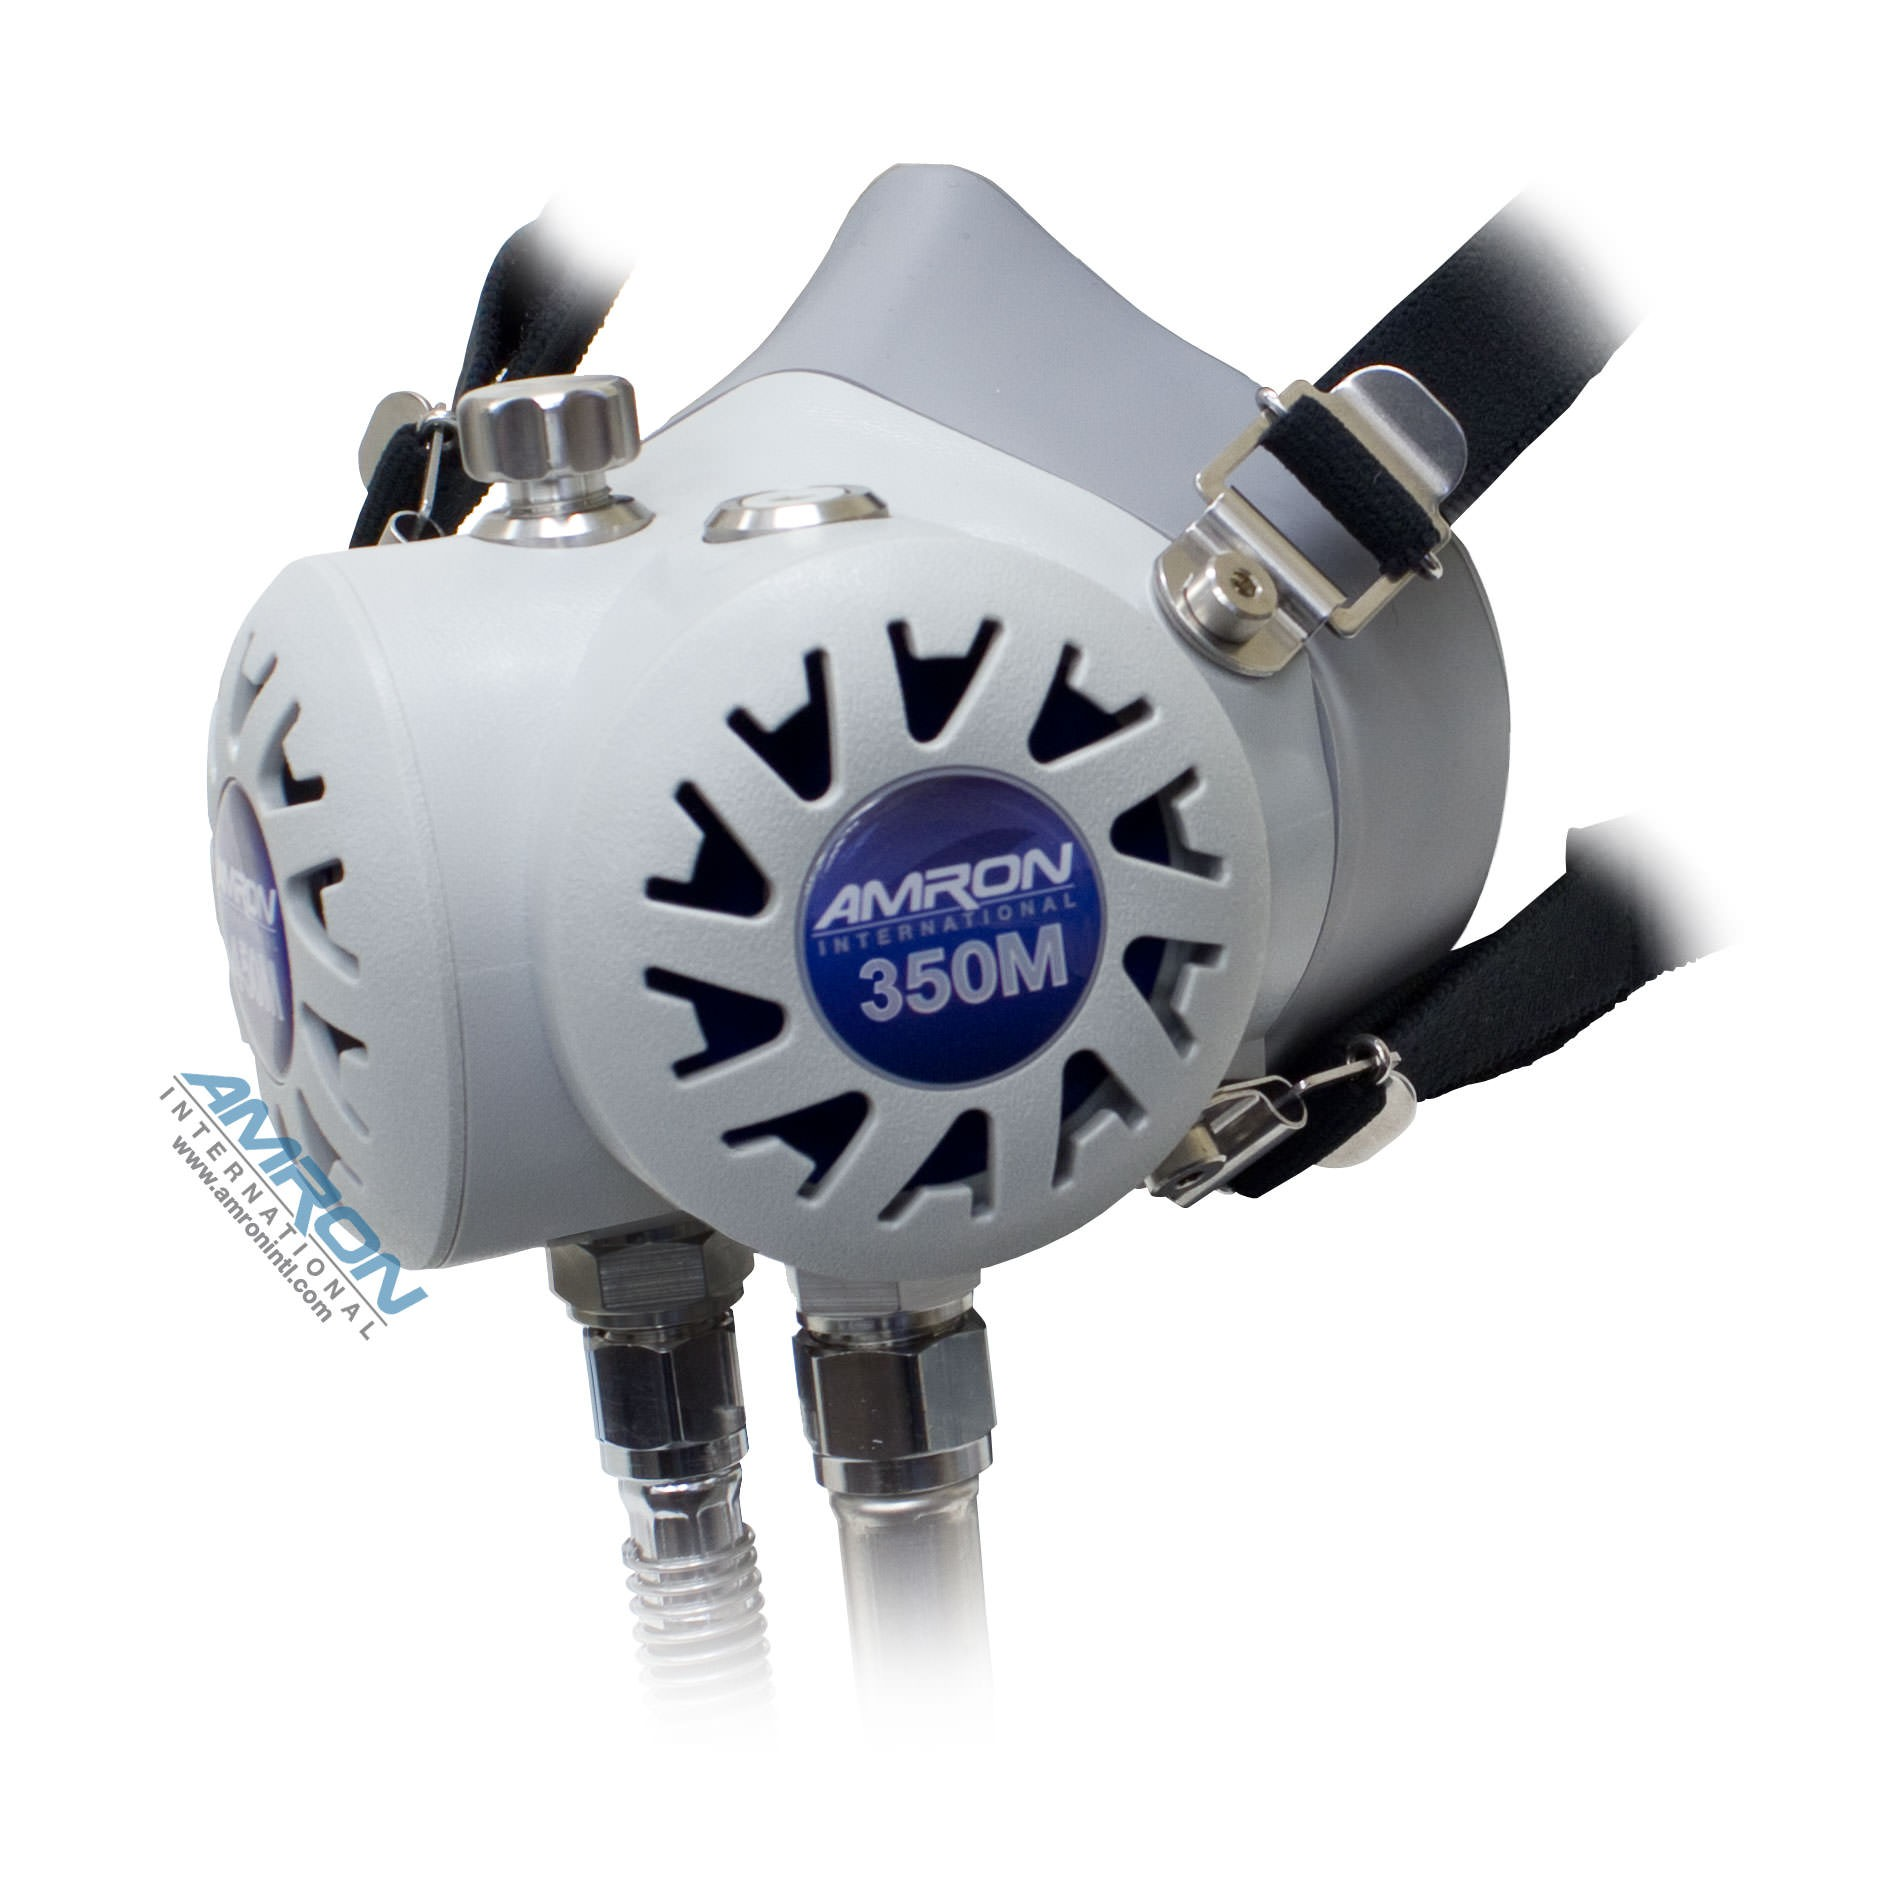 Amron International 350M BIBS Mask